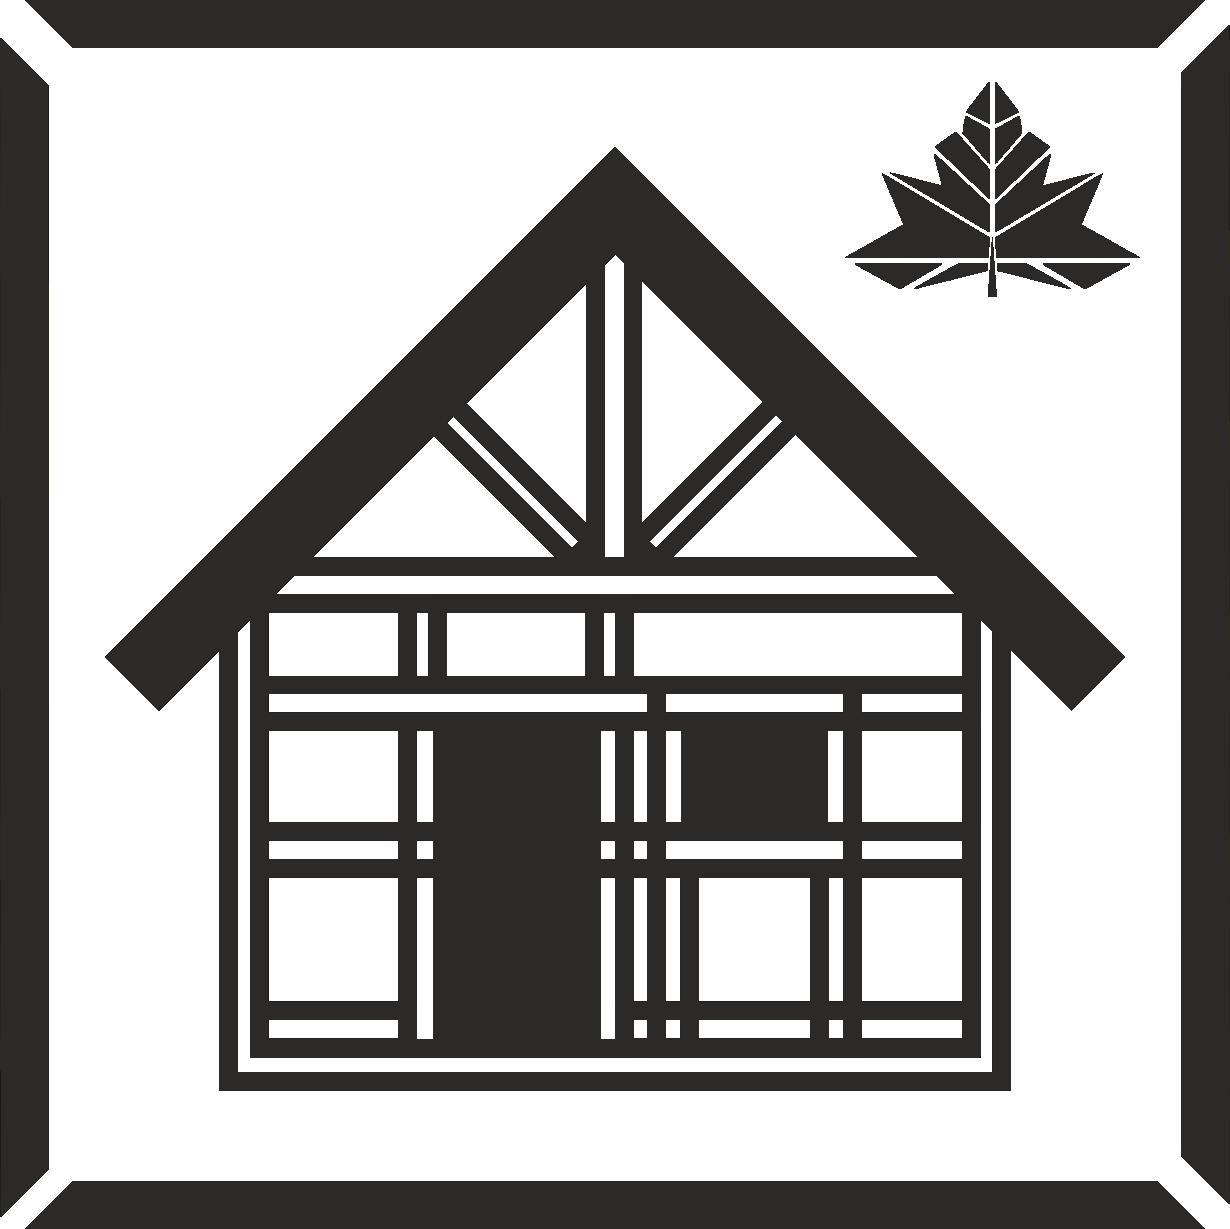 Win clipart cottage windows. Wood houses matioska design